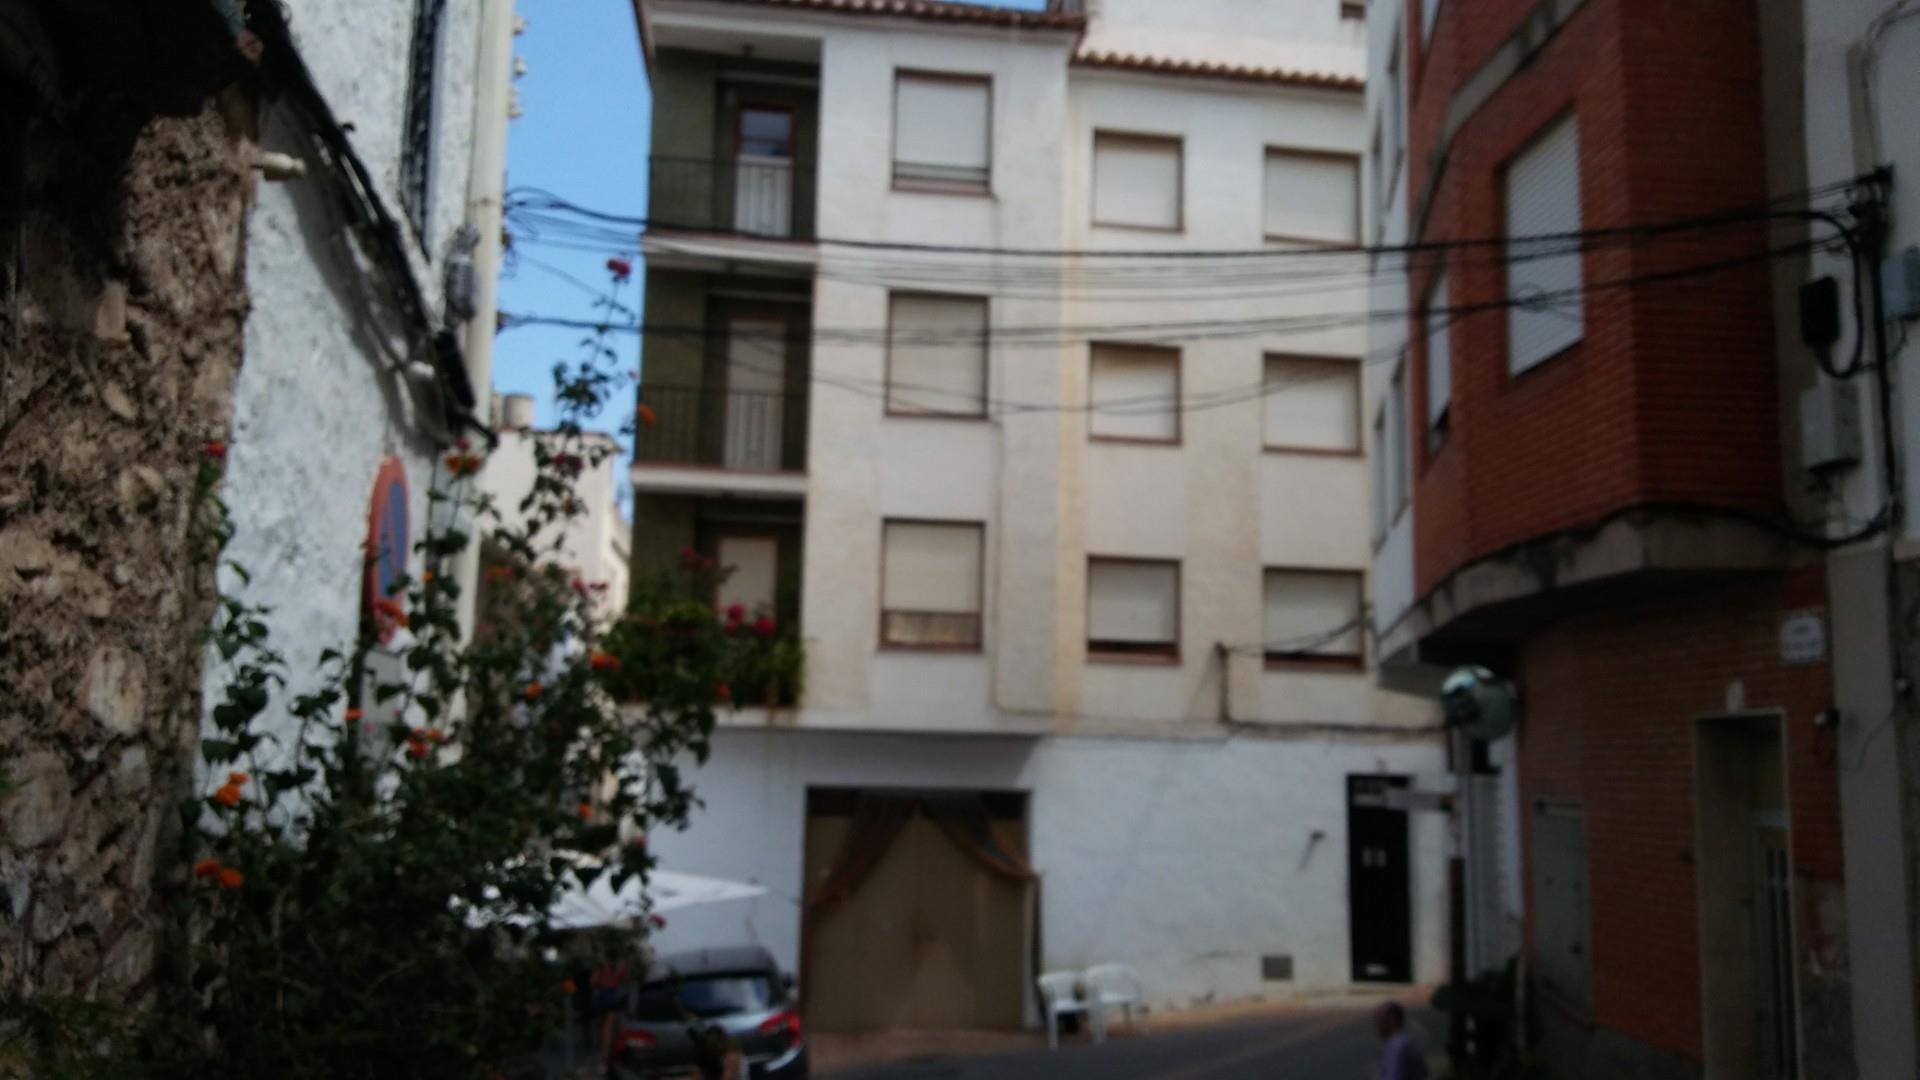 Appartamento  Calle san antonio. Eslida / calle san antonio